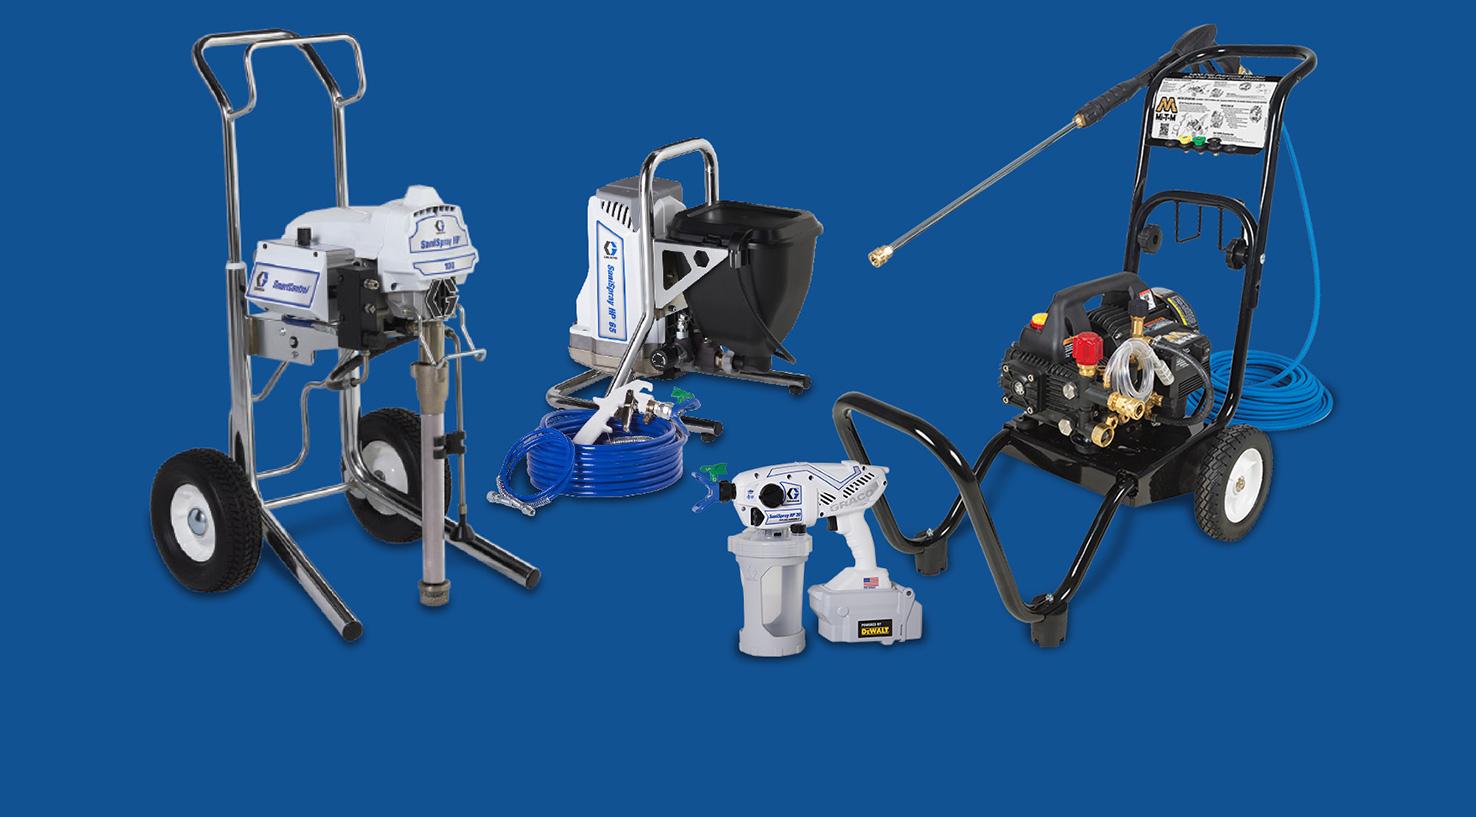 Equipment to Optimize Your Sanitizing Capabilities